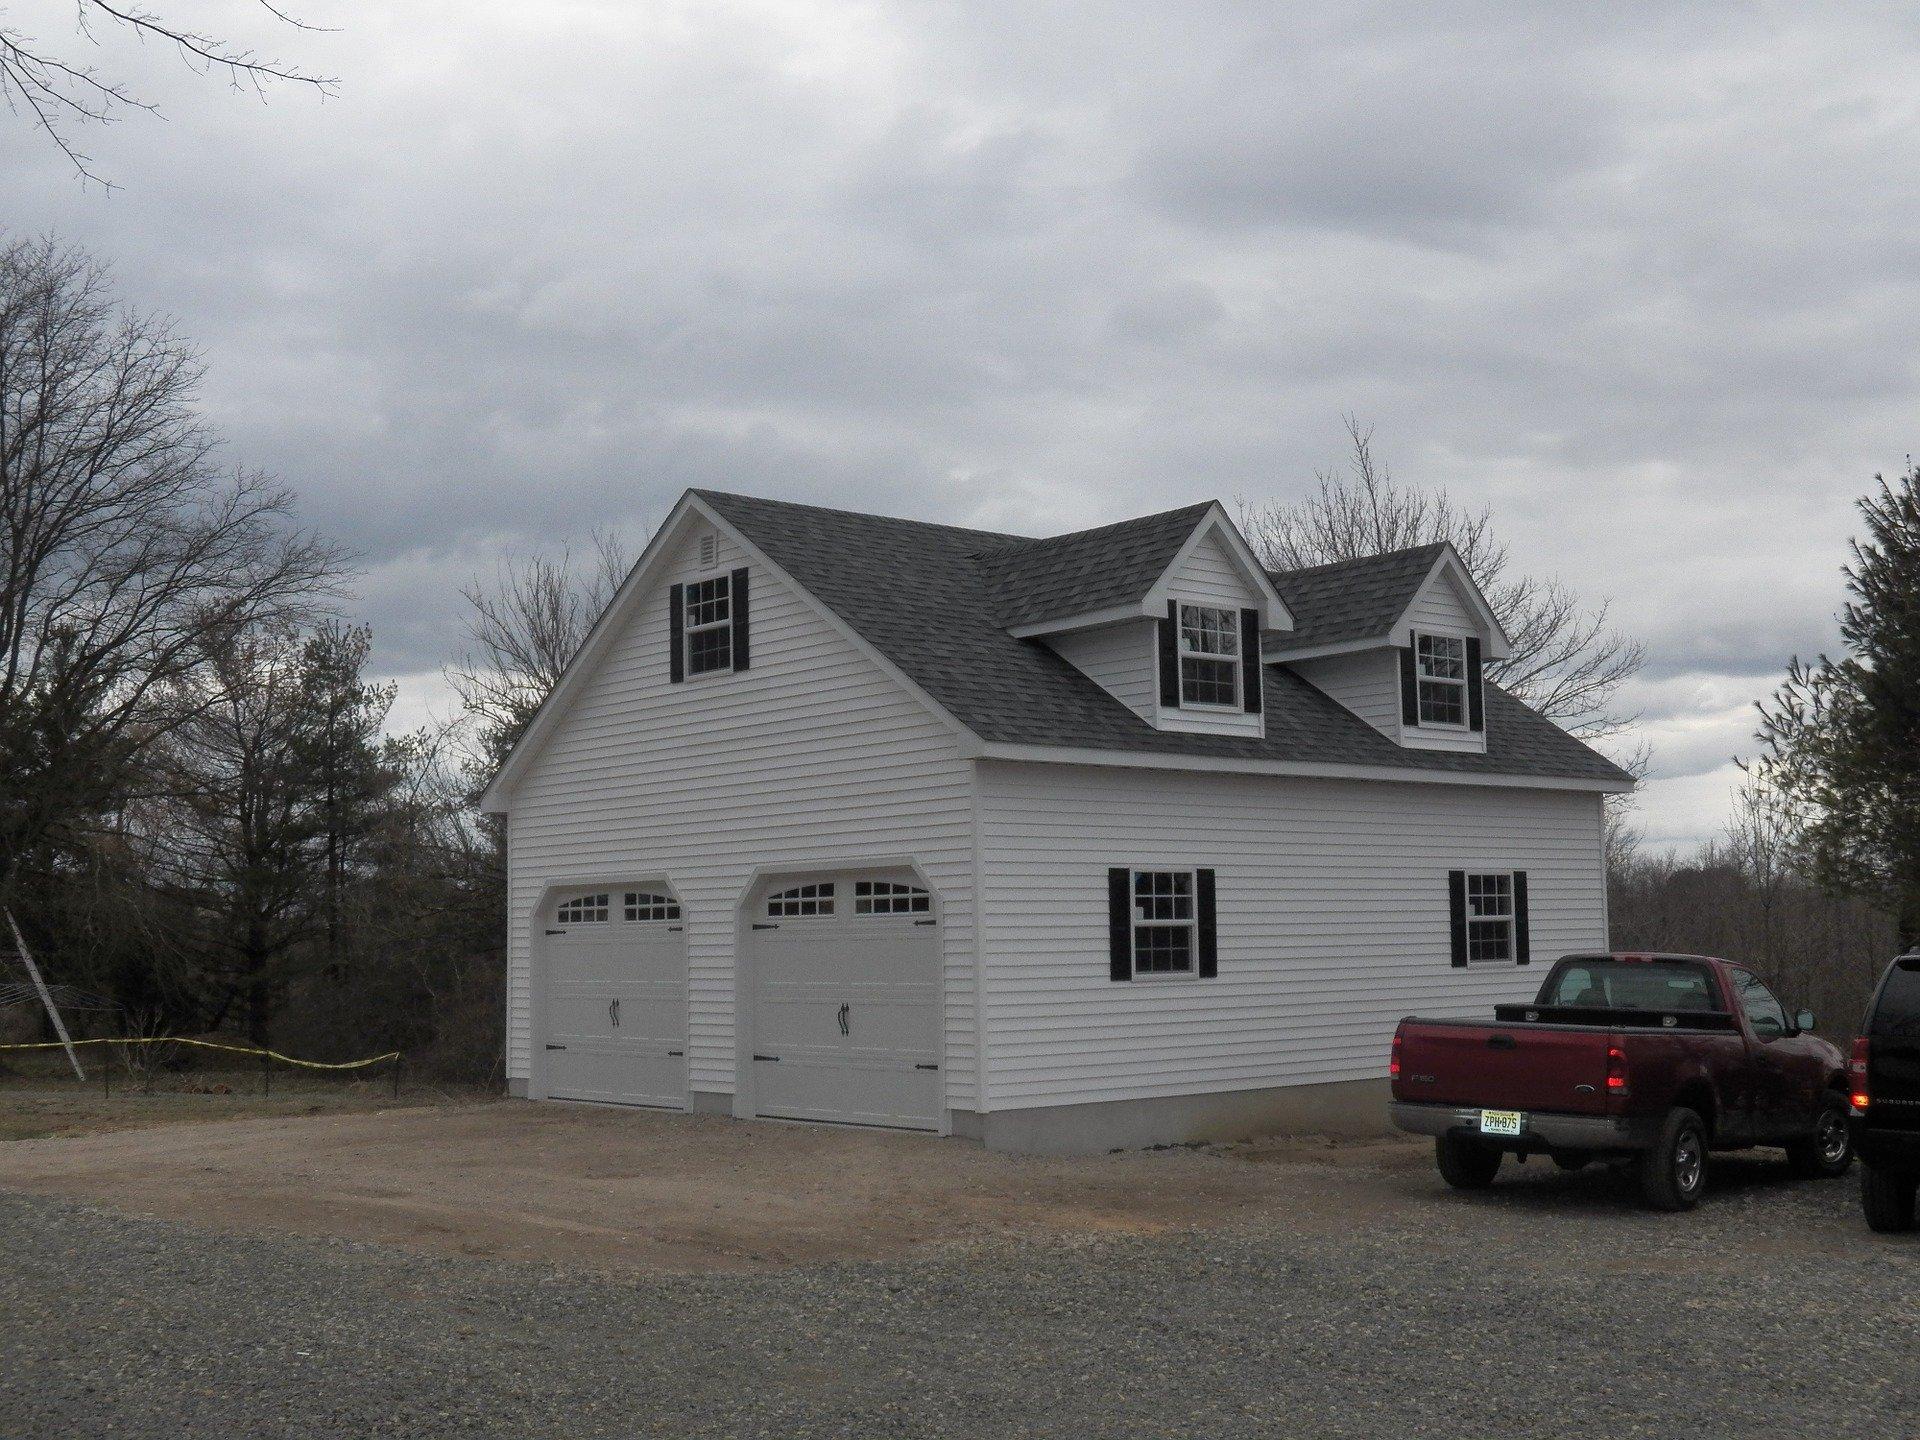 waterloo-structures-truss-garage-907120_1920